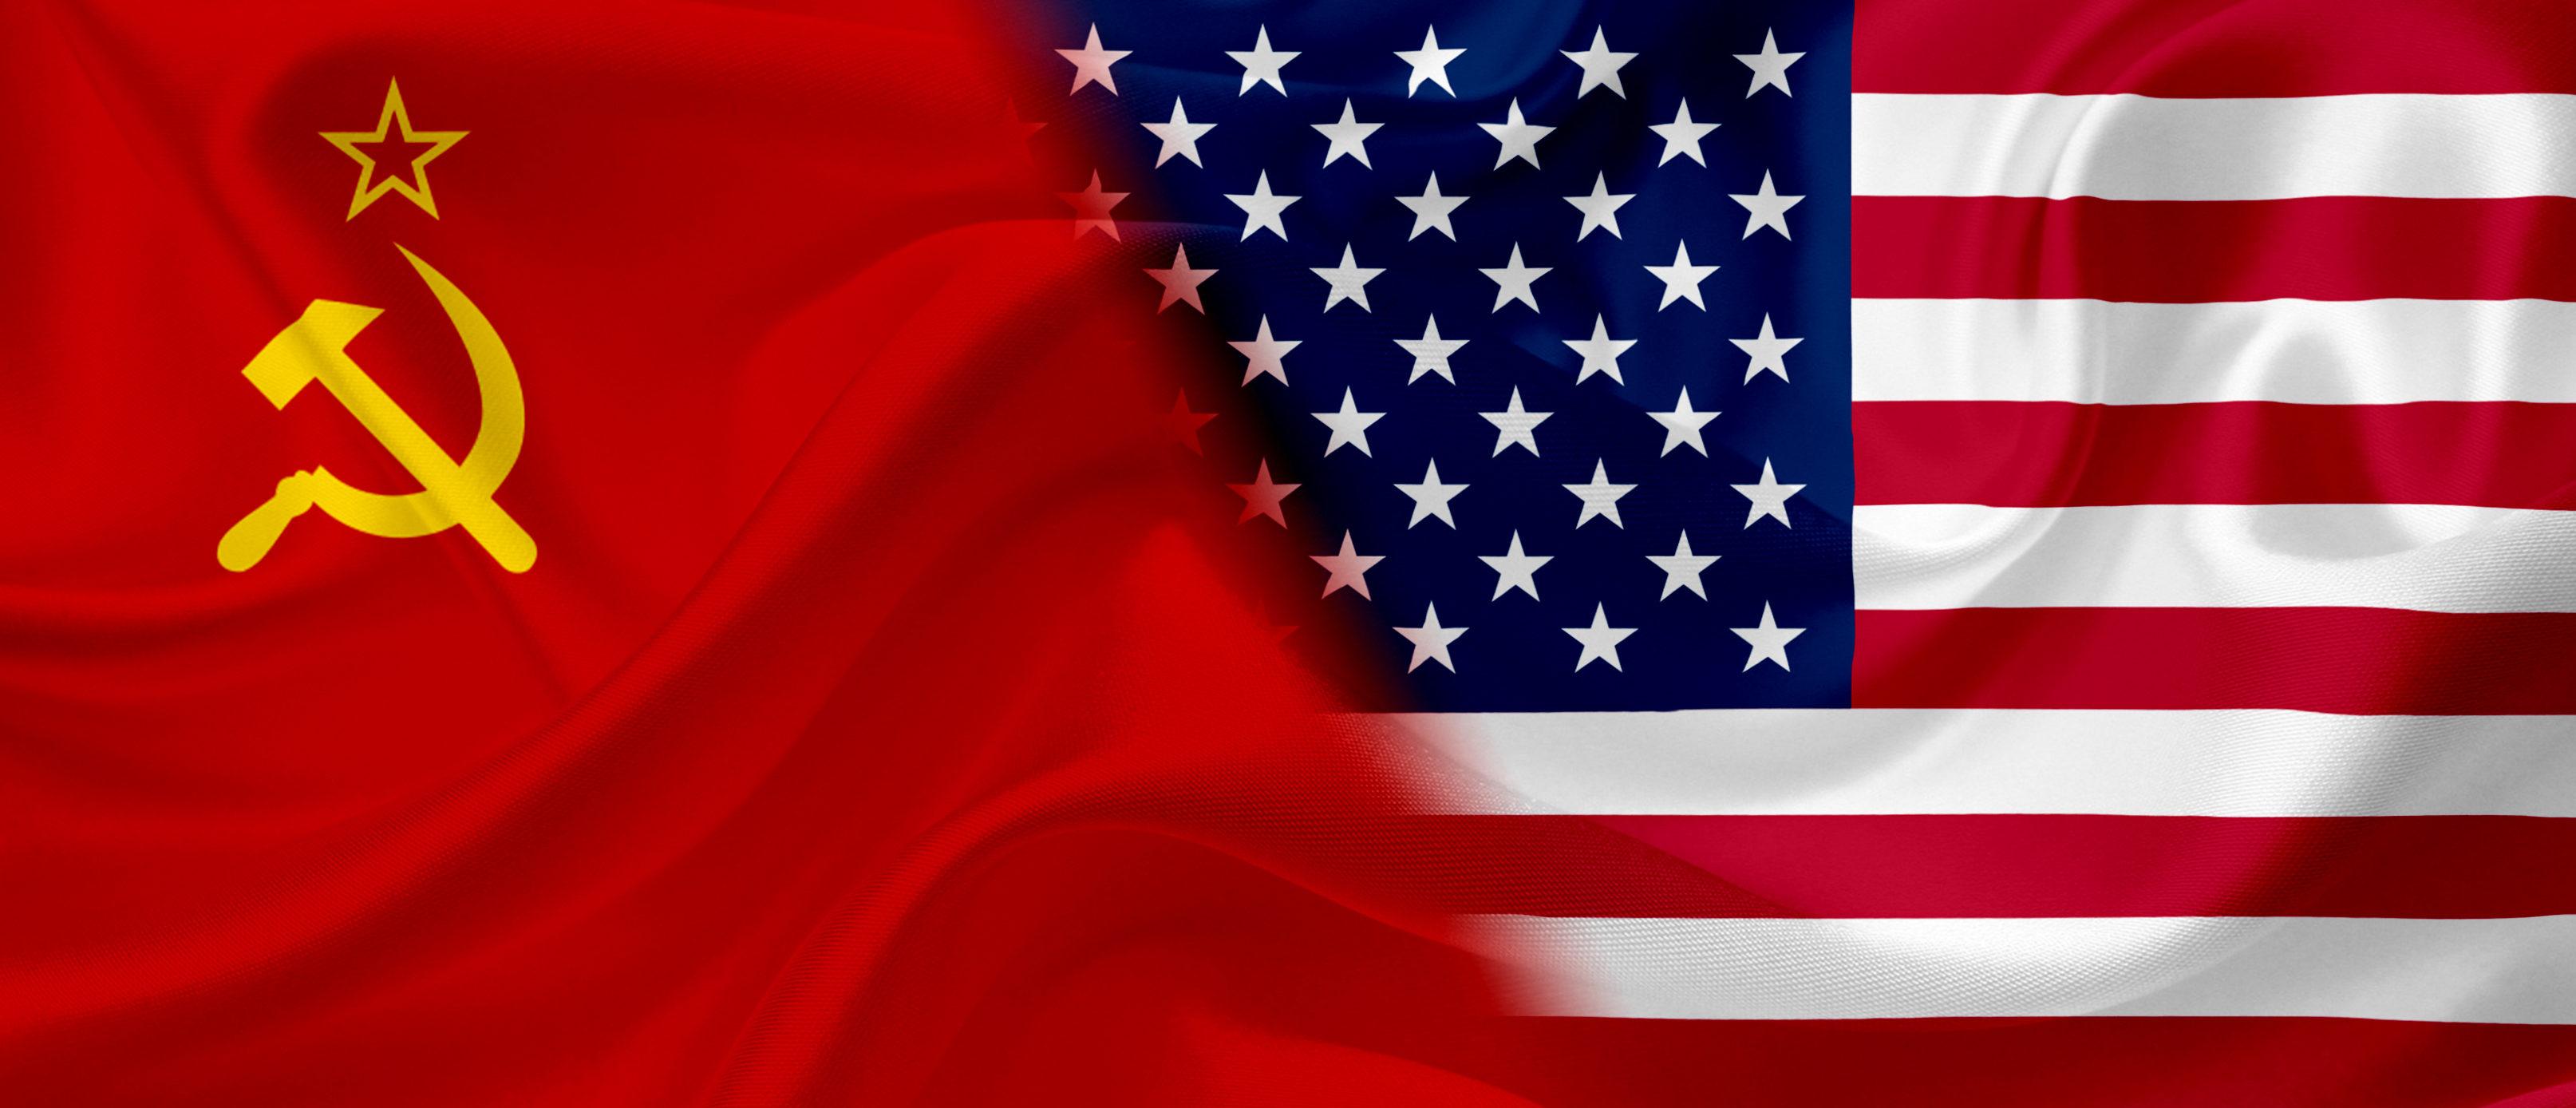 Soviet_US_Flags Source: byktzgl/Shutterstock